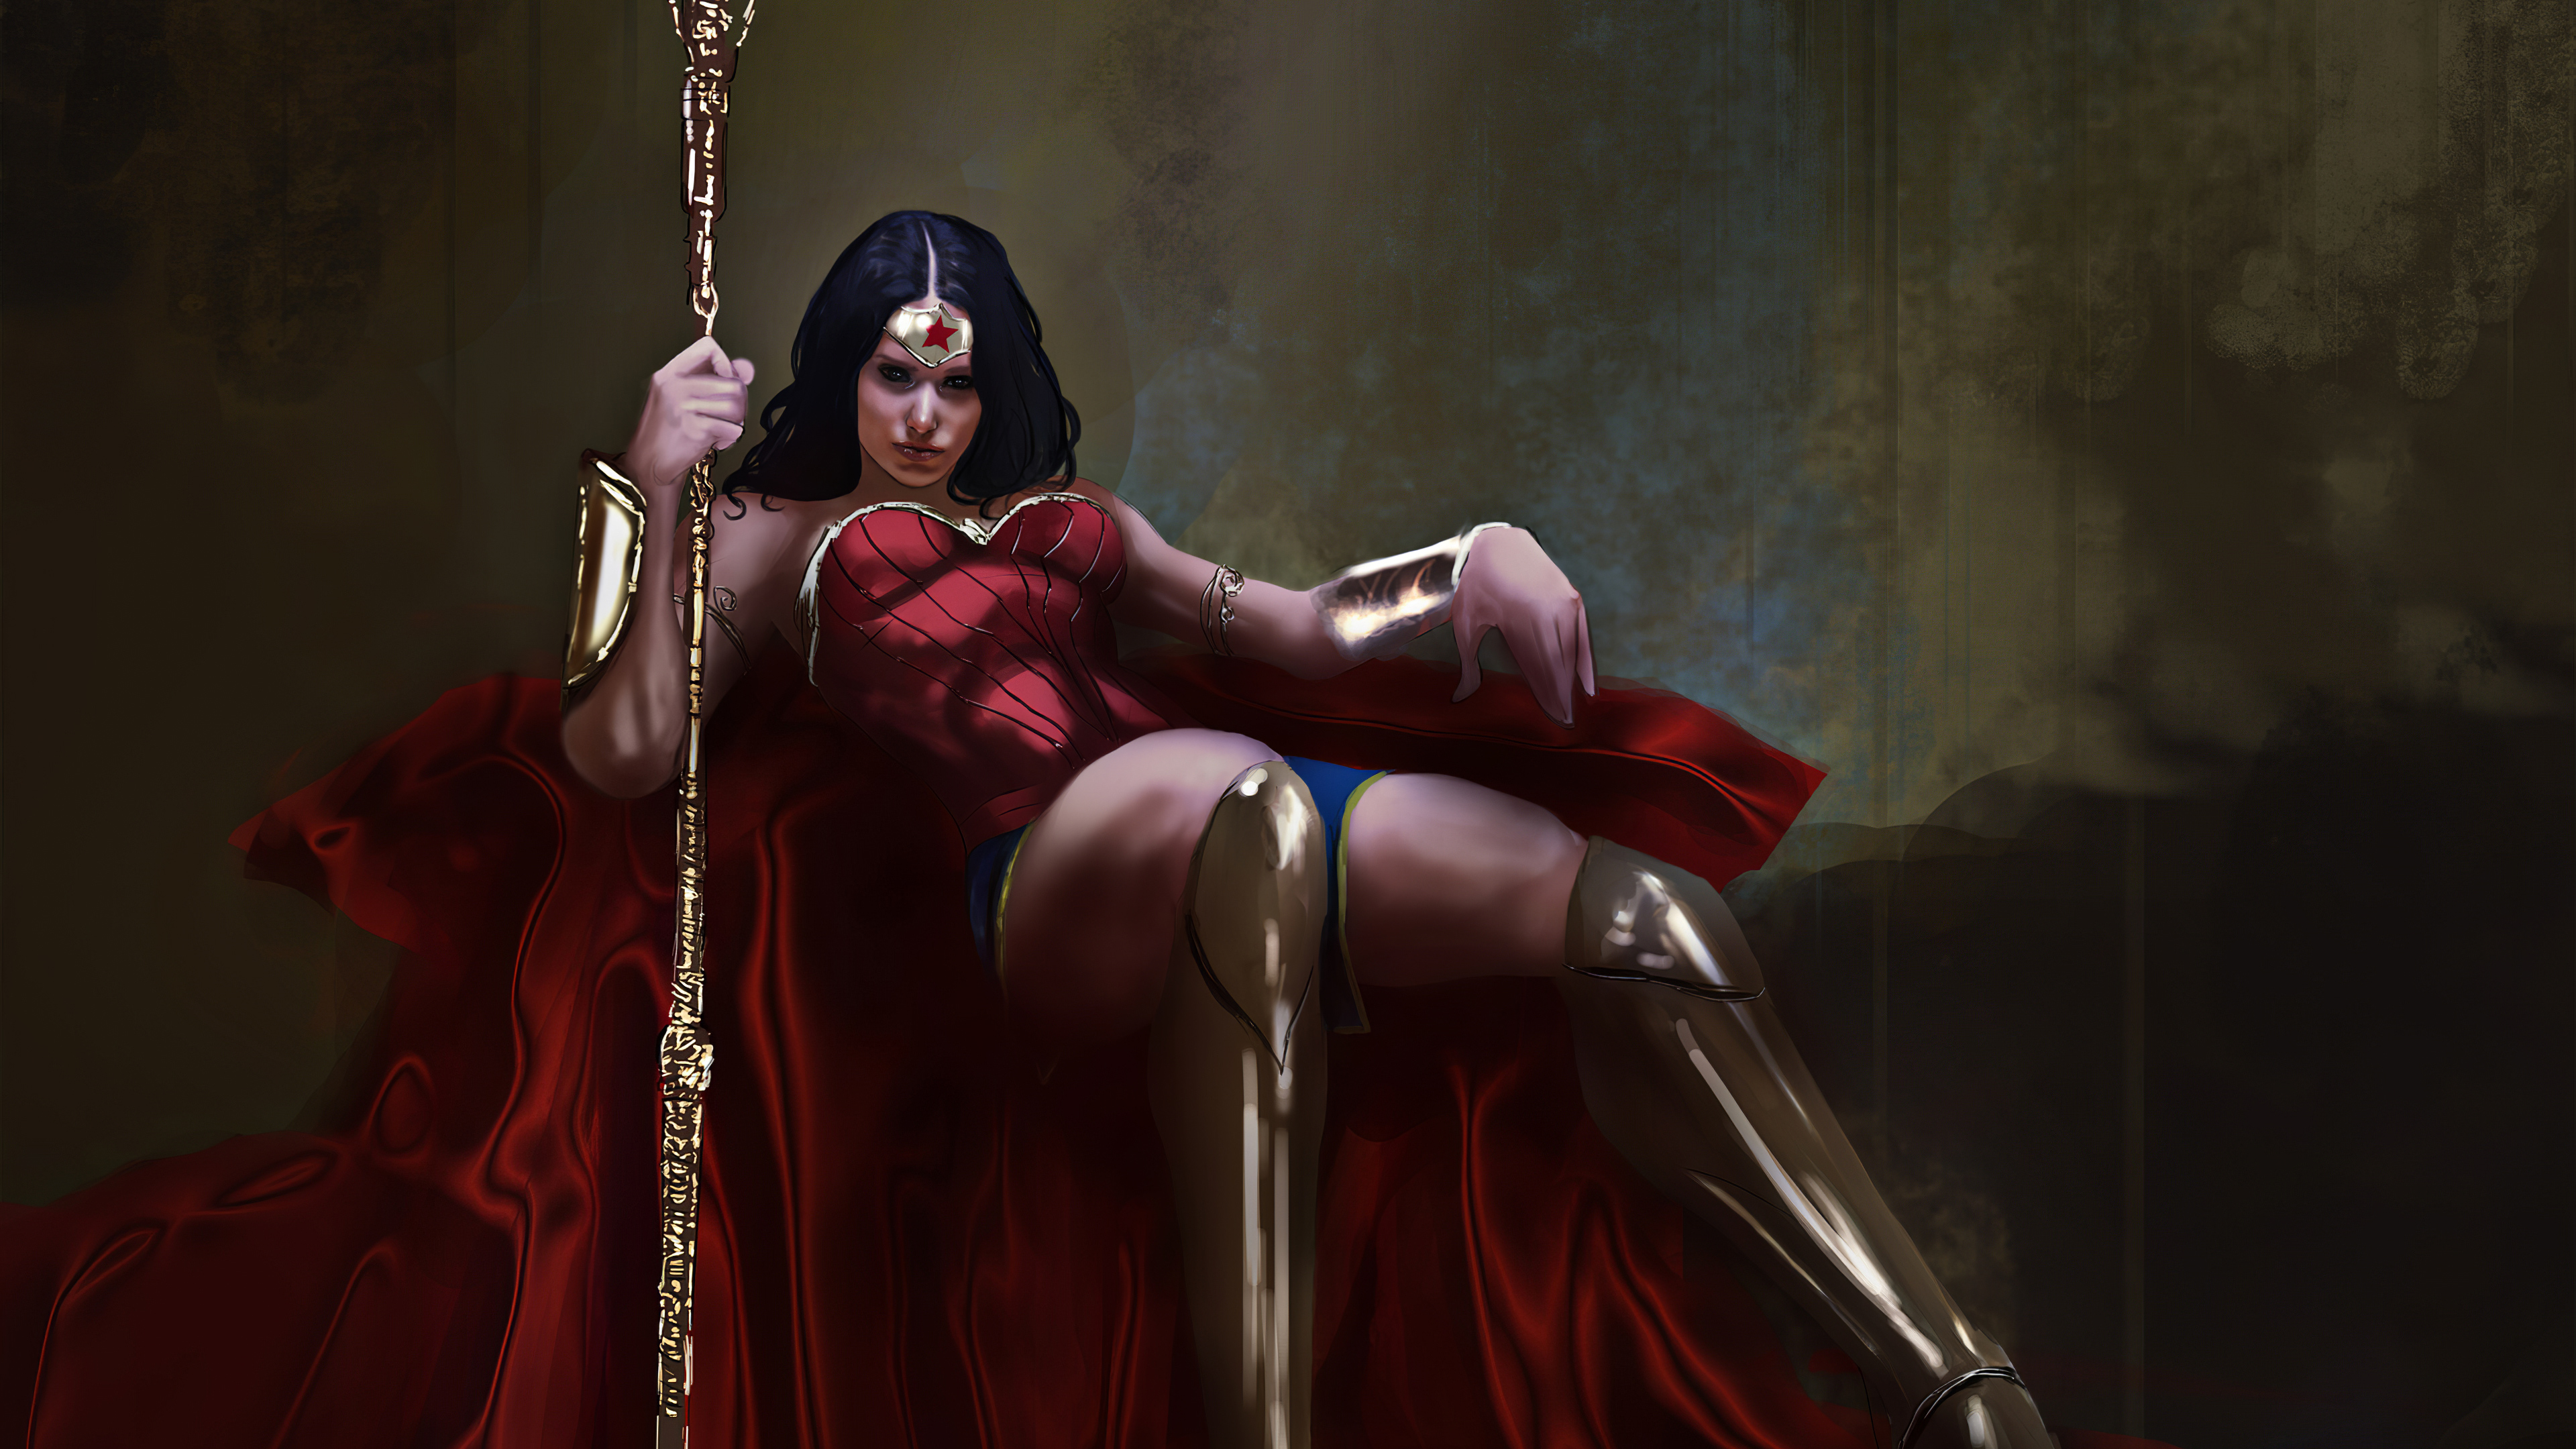 Wallpaper Wonder Woman Artwork 2020